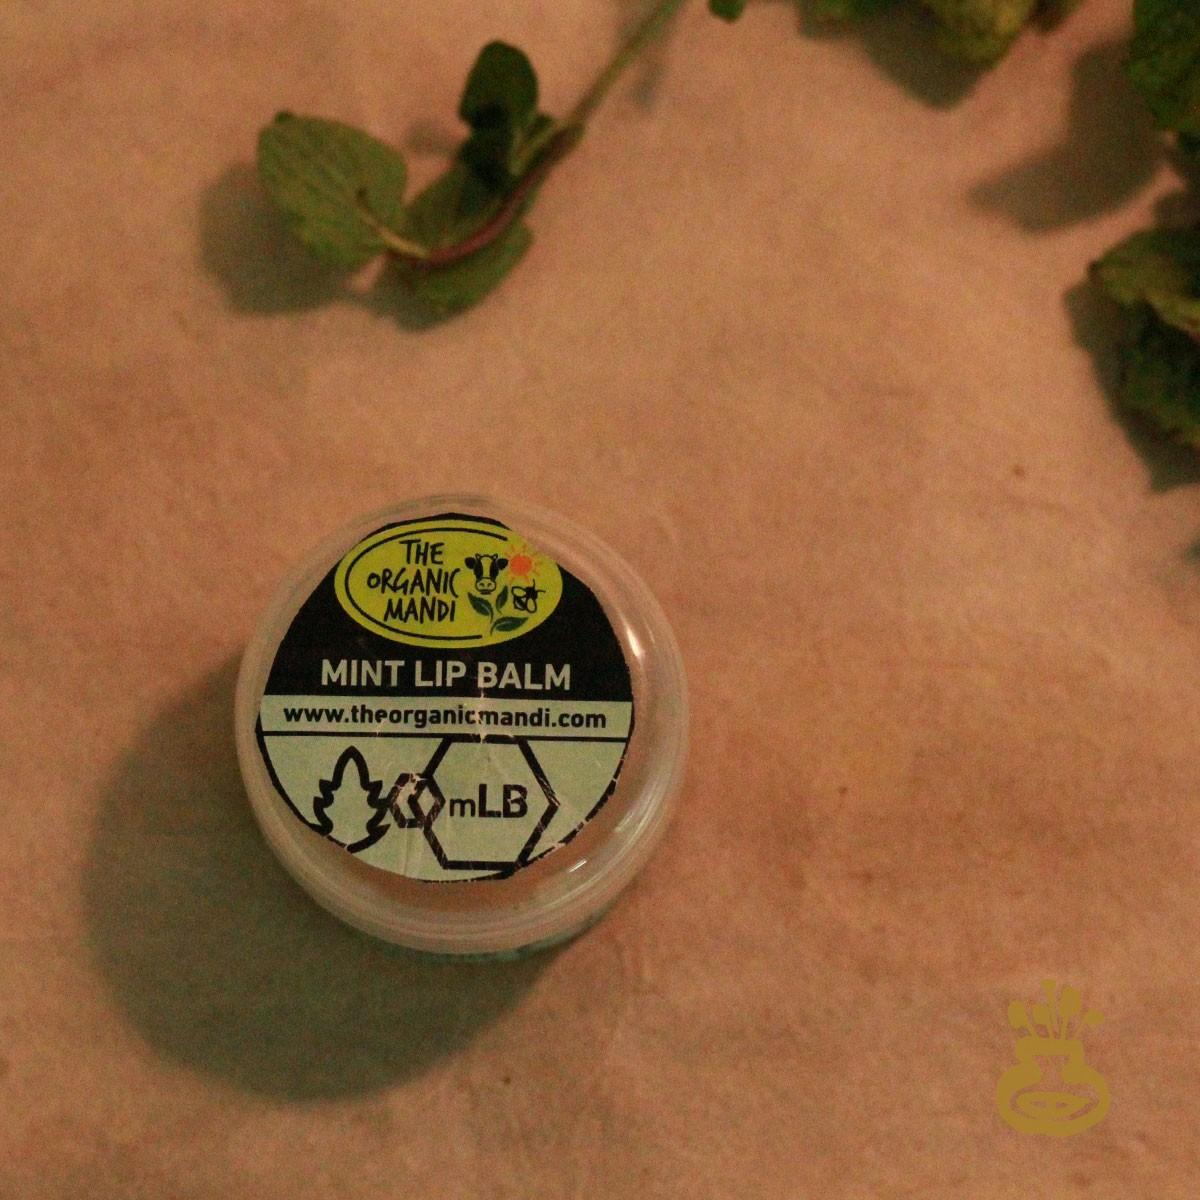 Mint Lip Balm (15g)